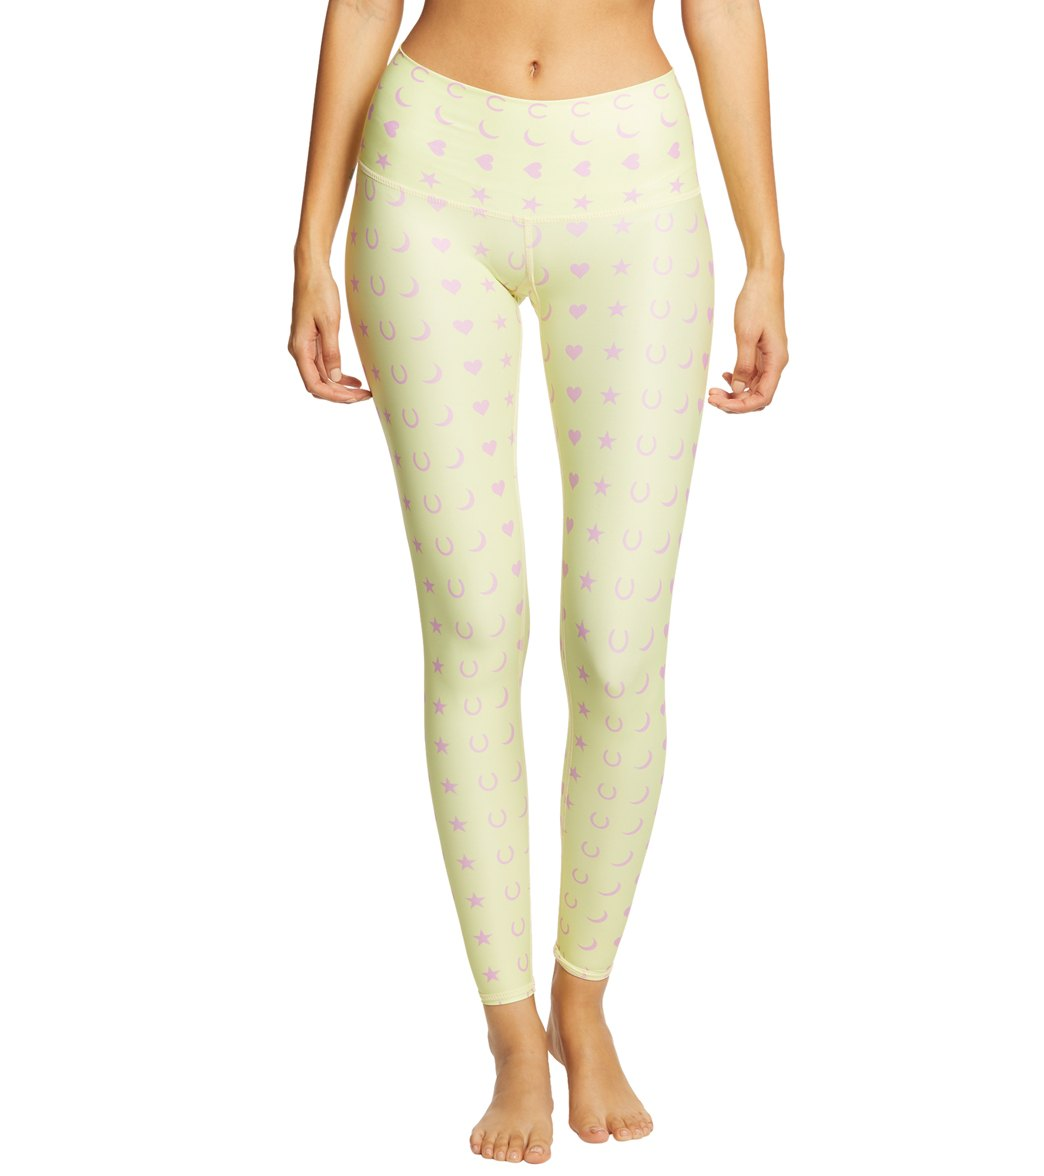 8ba8b595bf Teeki Fortune Teller Hot Yoga Pants at YogaOutlet.com - Free Shipping